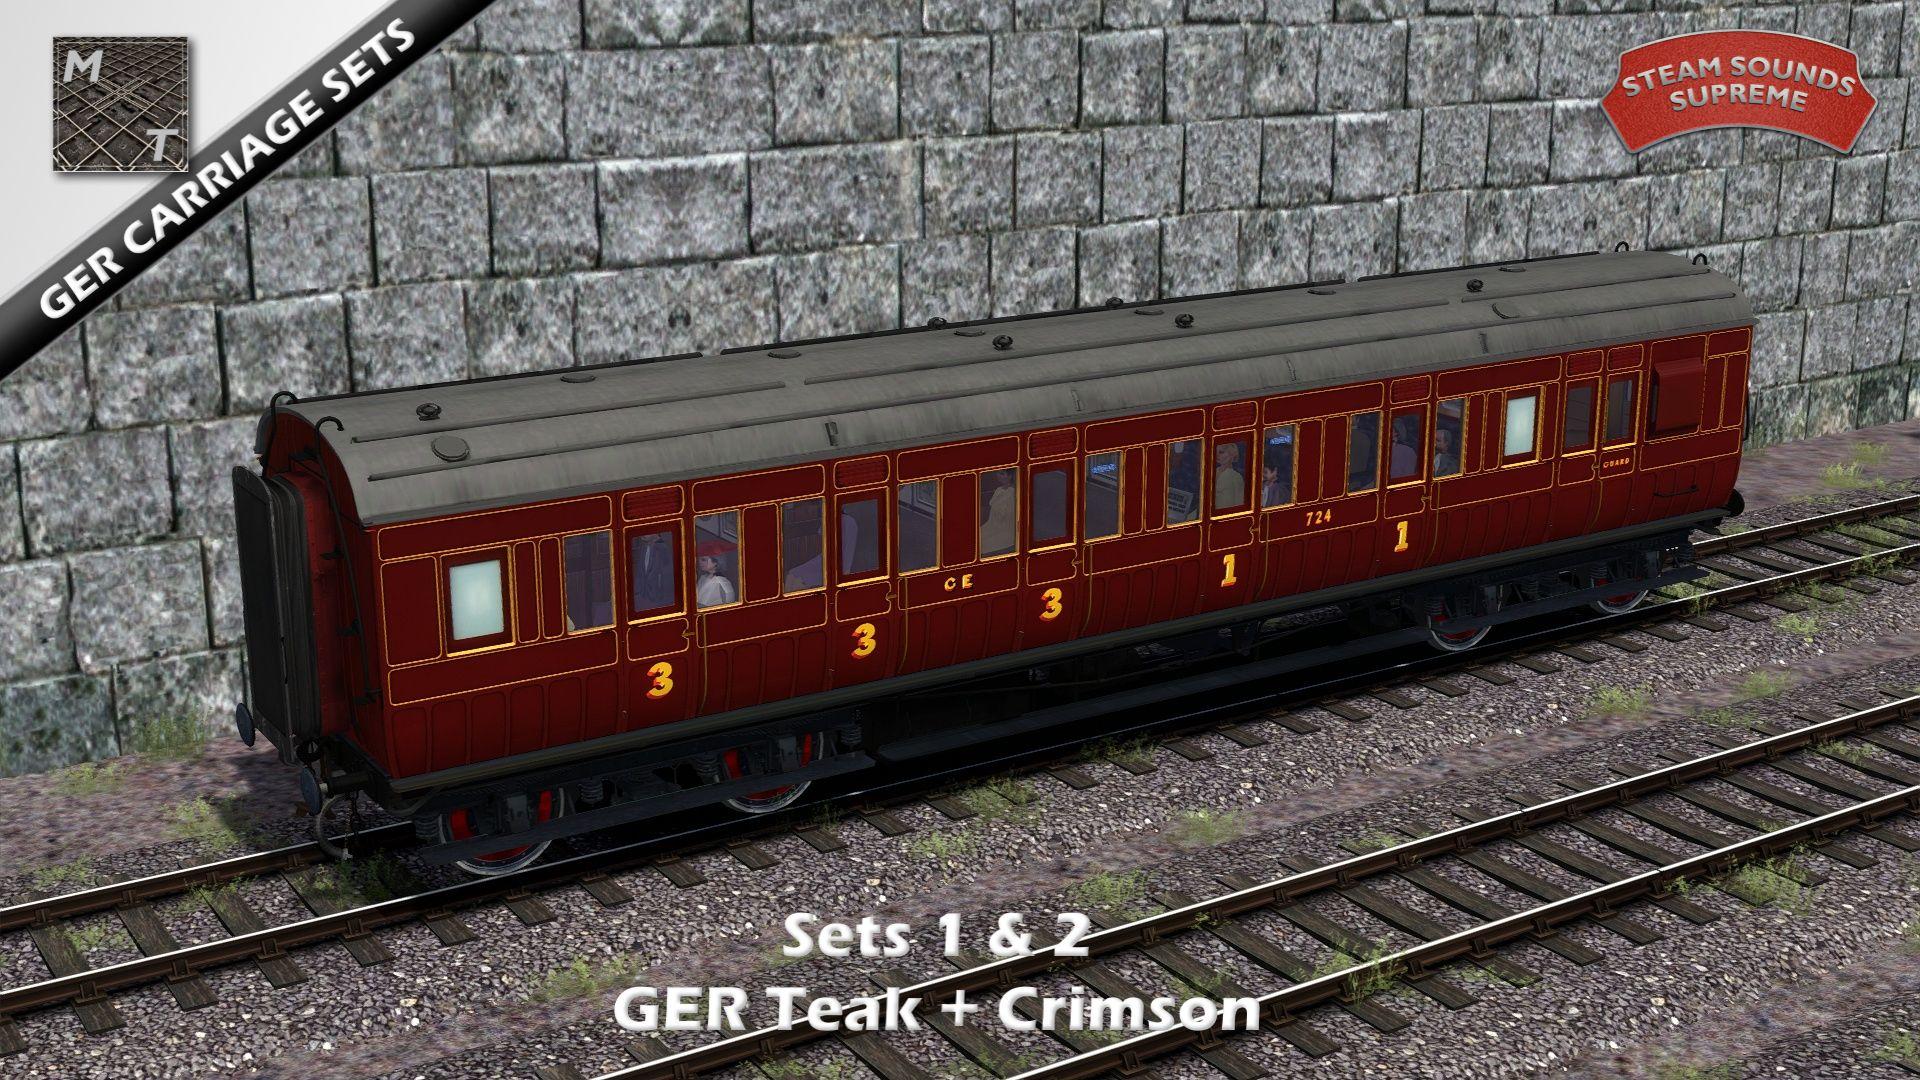 GERCorrSet1-2_19.jpg